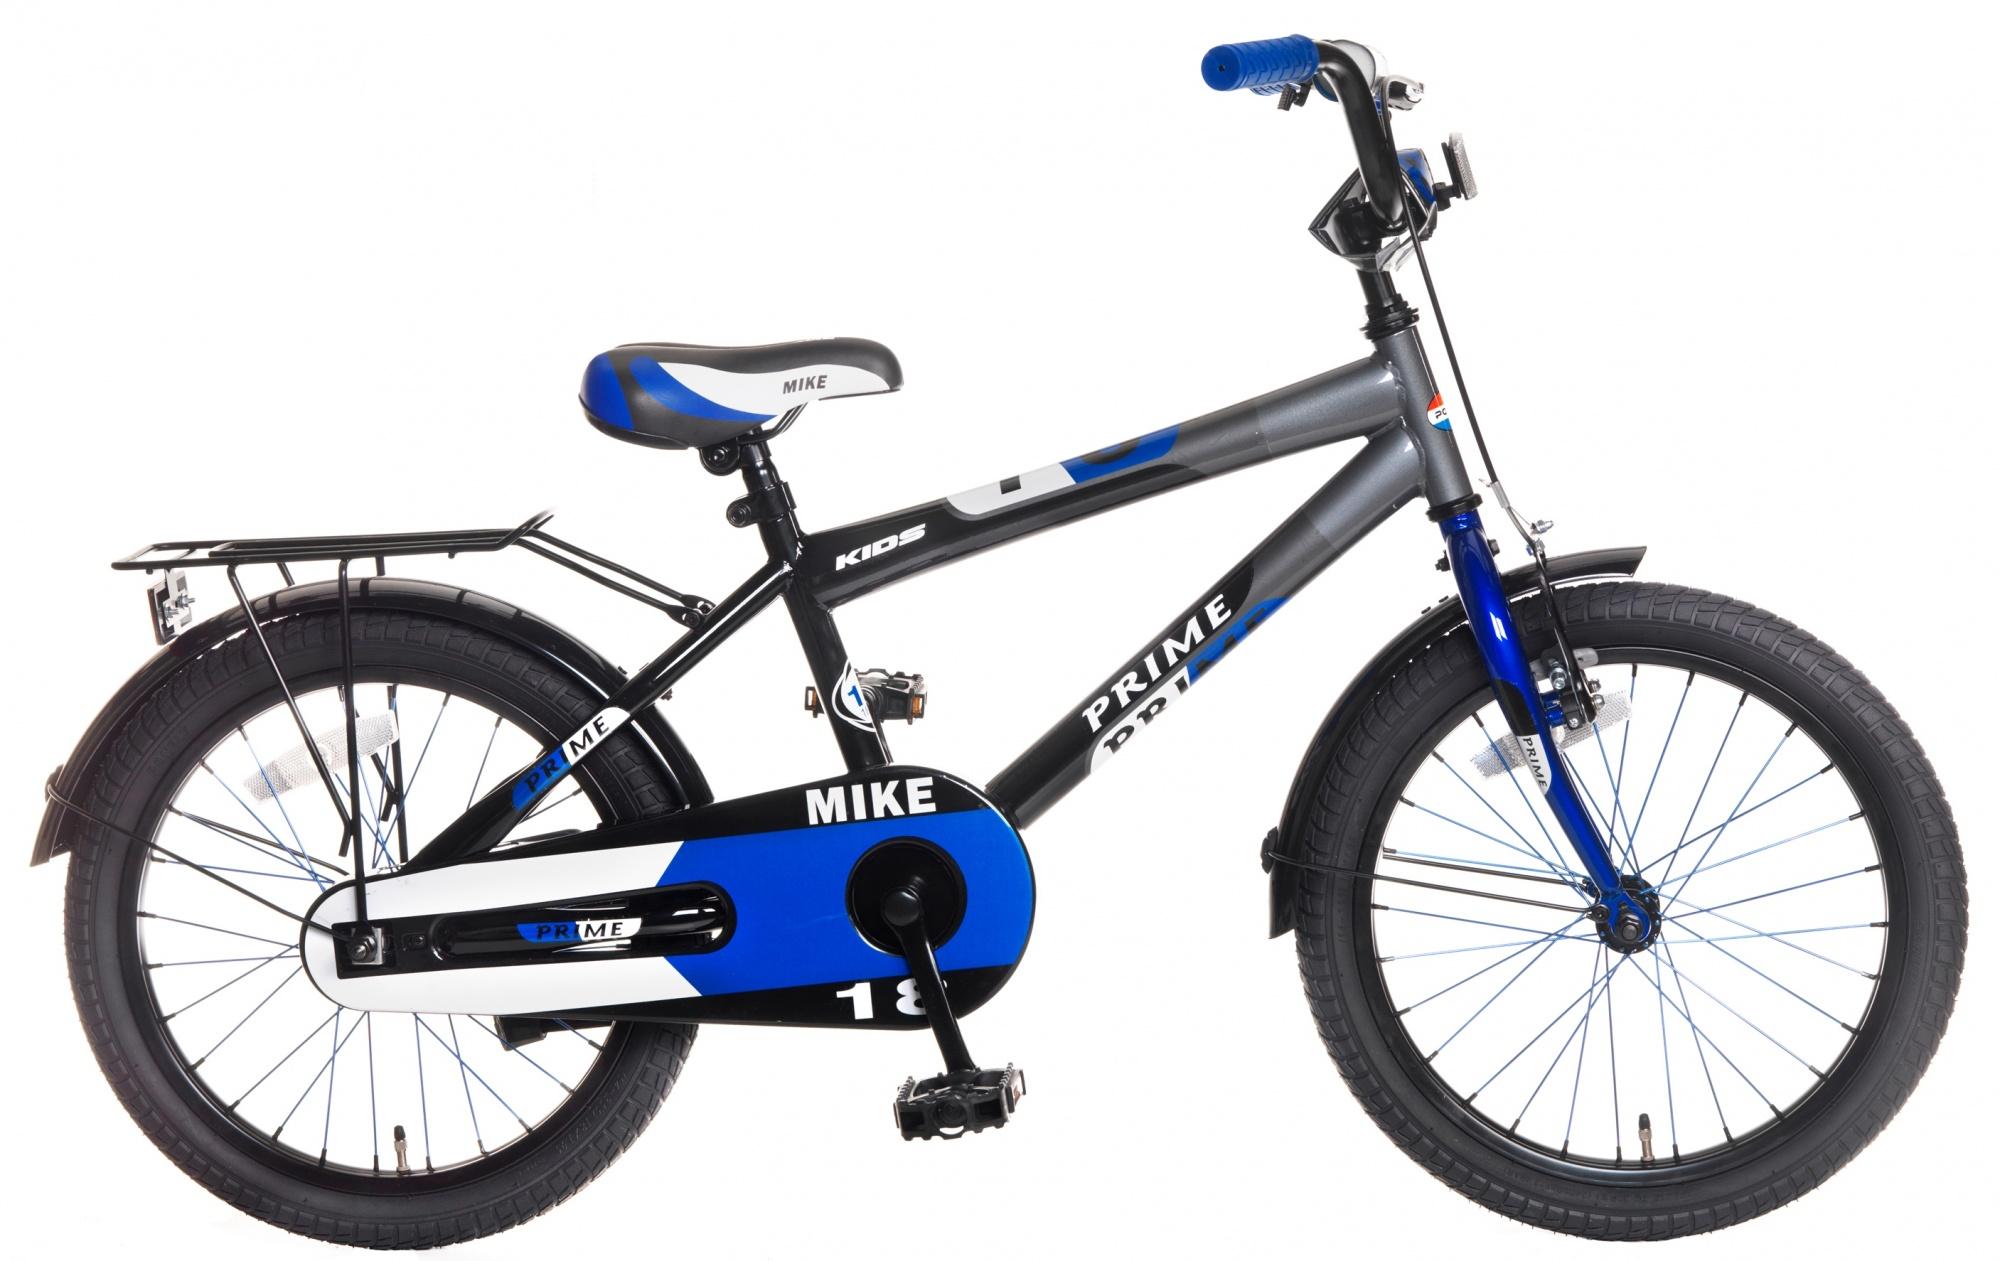 Popal Mike 18 Zoll Jungen Rücktrittbremse Blau/Grau - Internet-Bikes